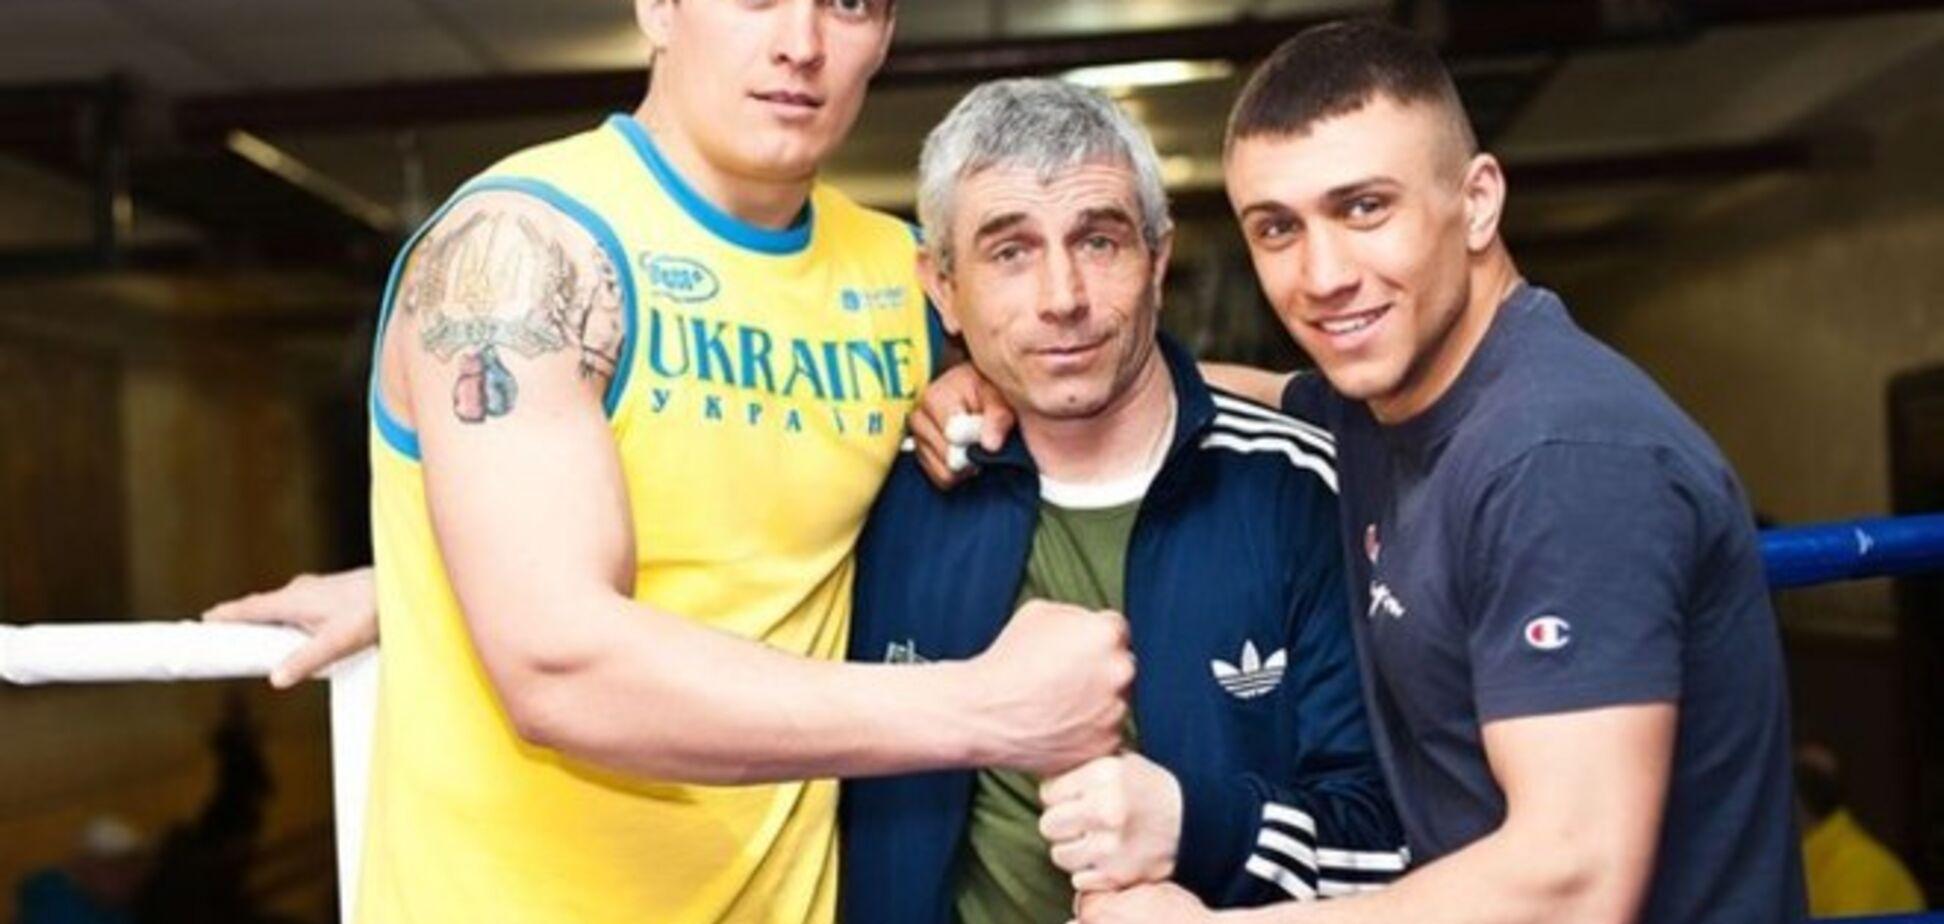 Усика и Ломаченко обвинили в отсутствии патриотизма